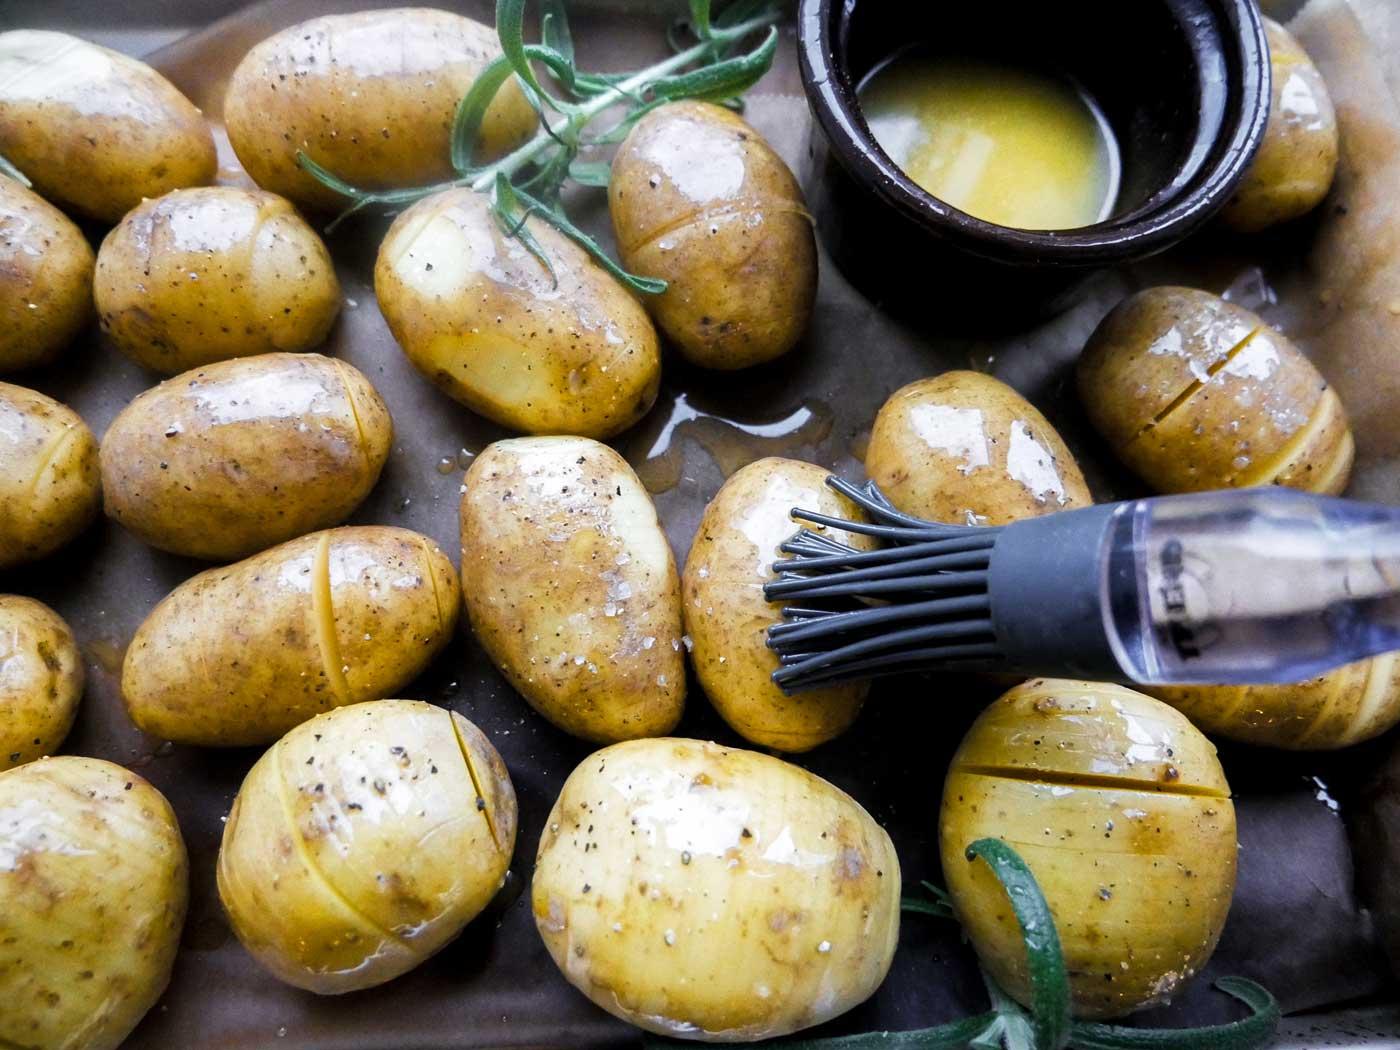 kartofler til hasselbagte i ovnen pensles